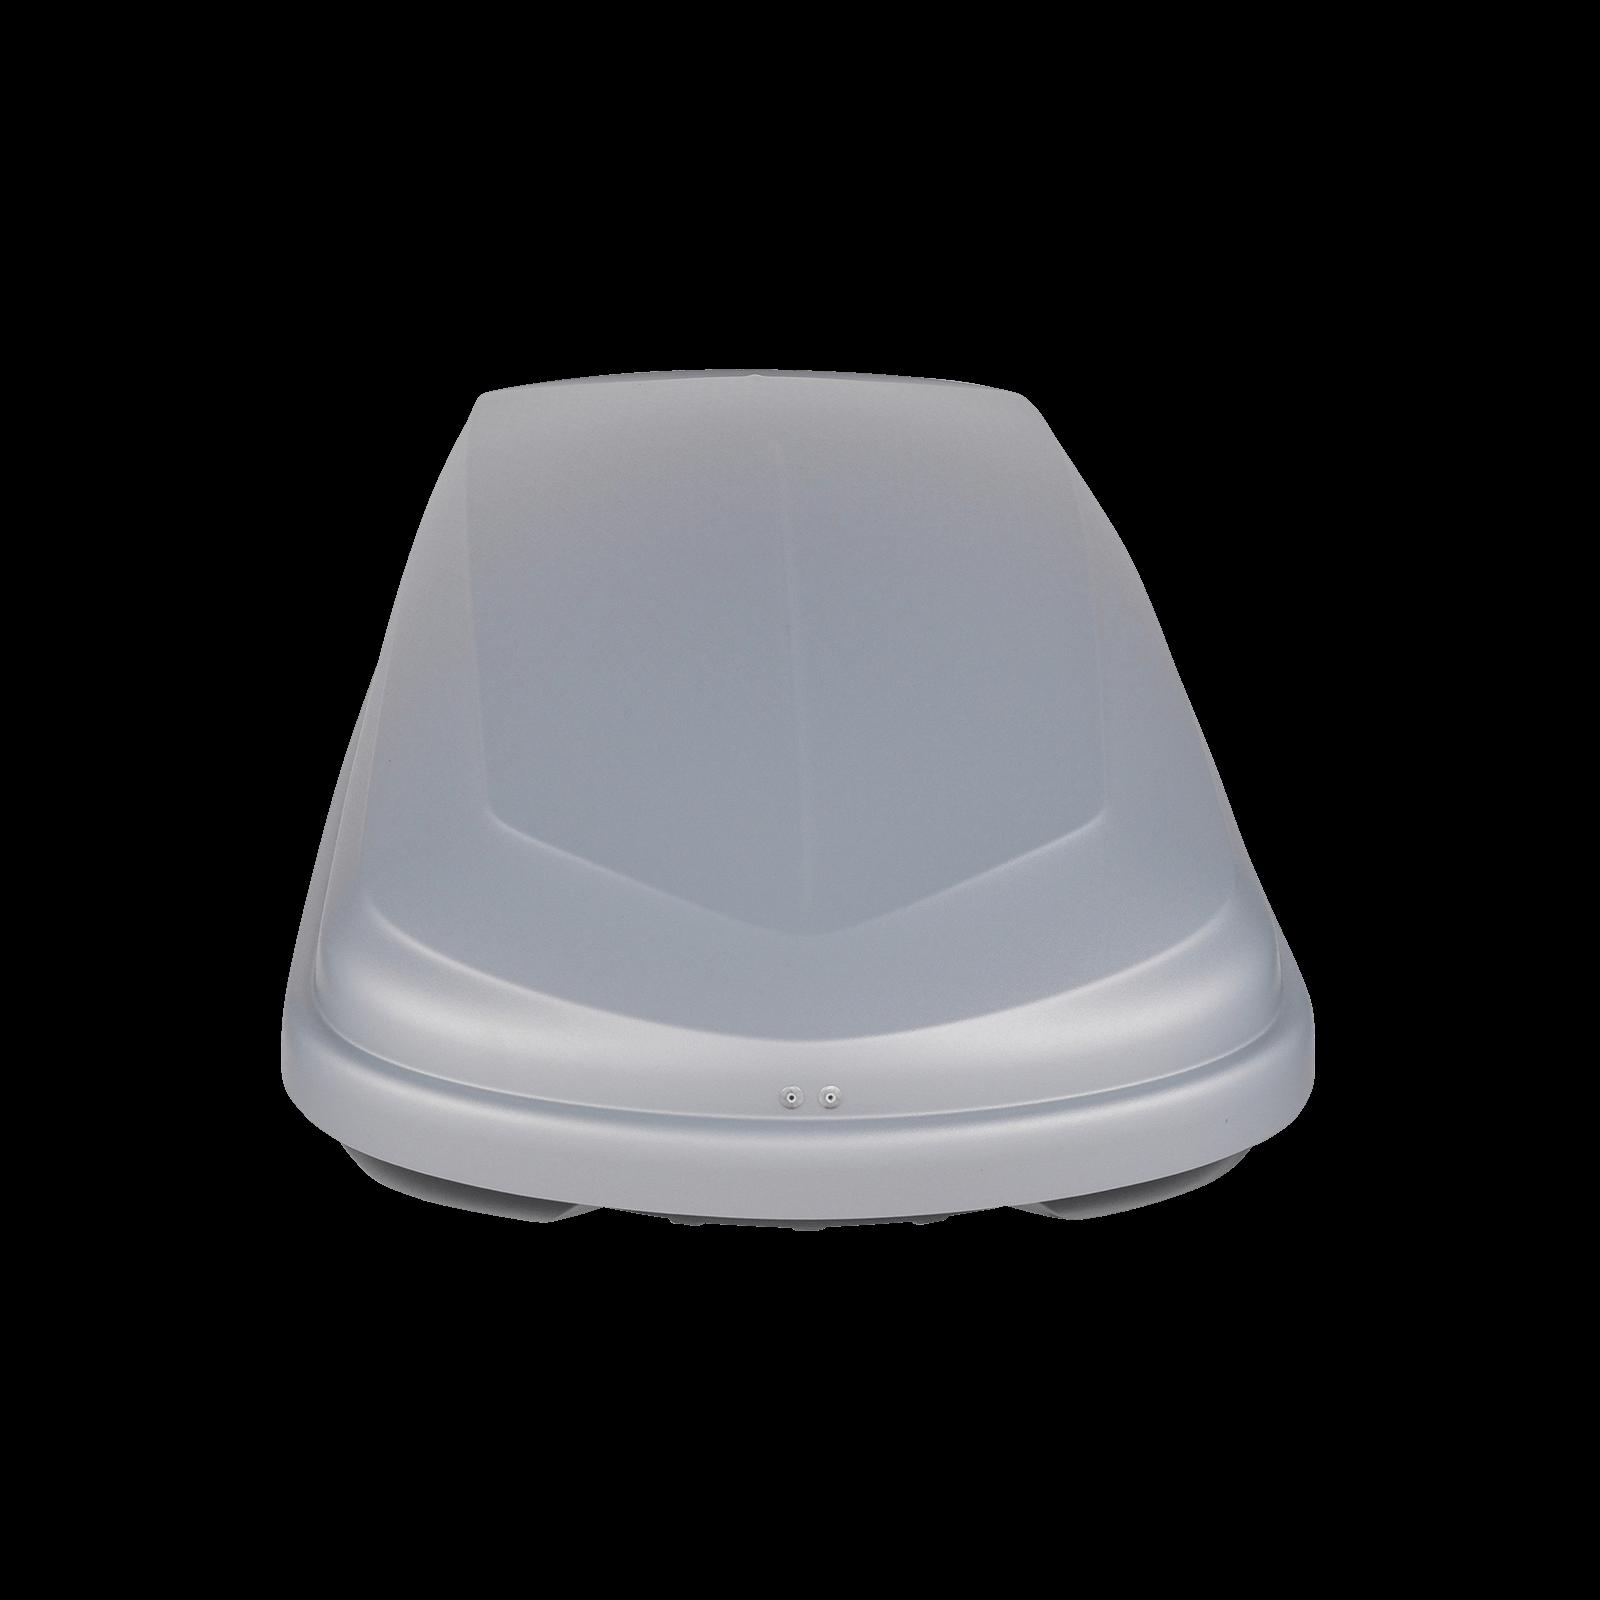 Dachbox Hapro Traxer 5.6 SilverGrey - Bild 3